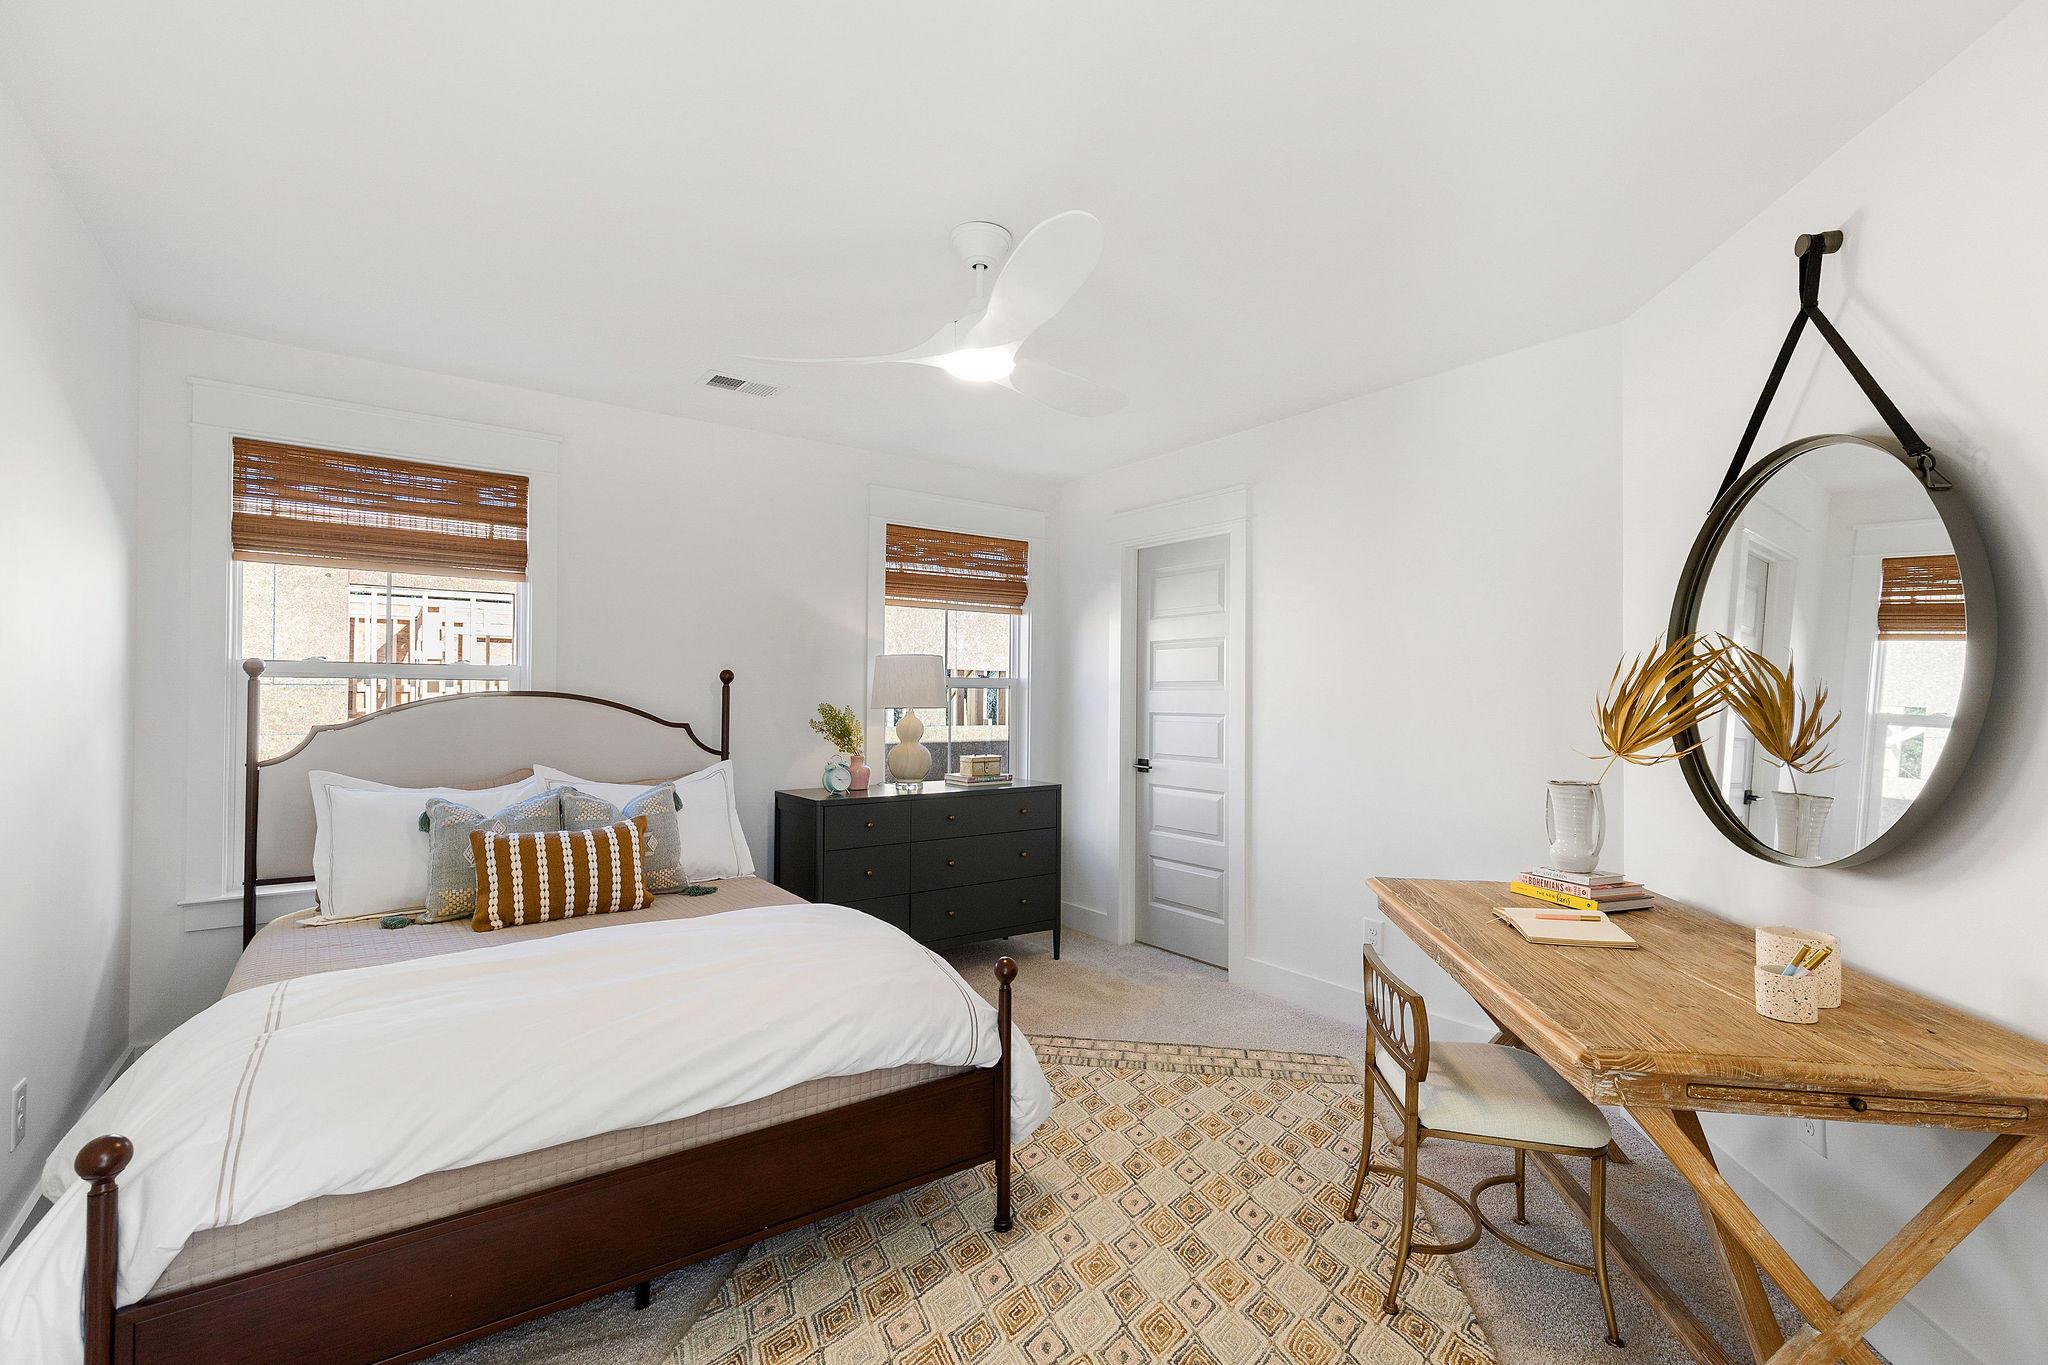 Avenue of Oaks Homes For Sale - 1027 Avenue Of Oaks, Charleston, SC - 7